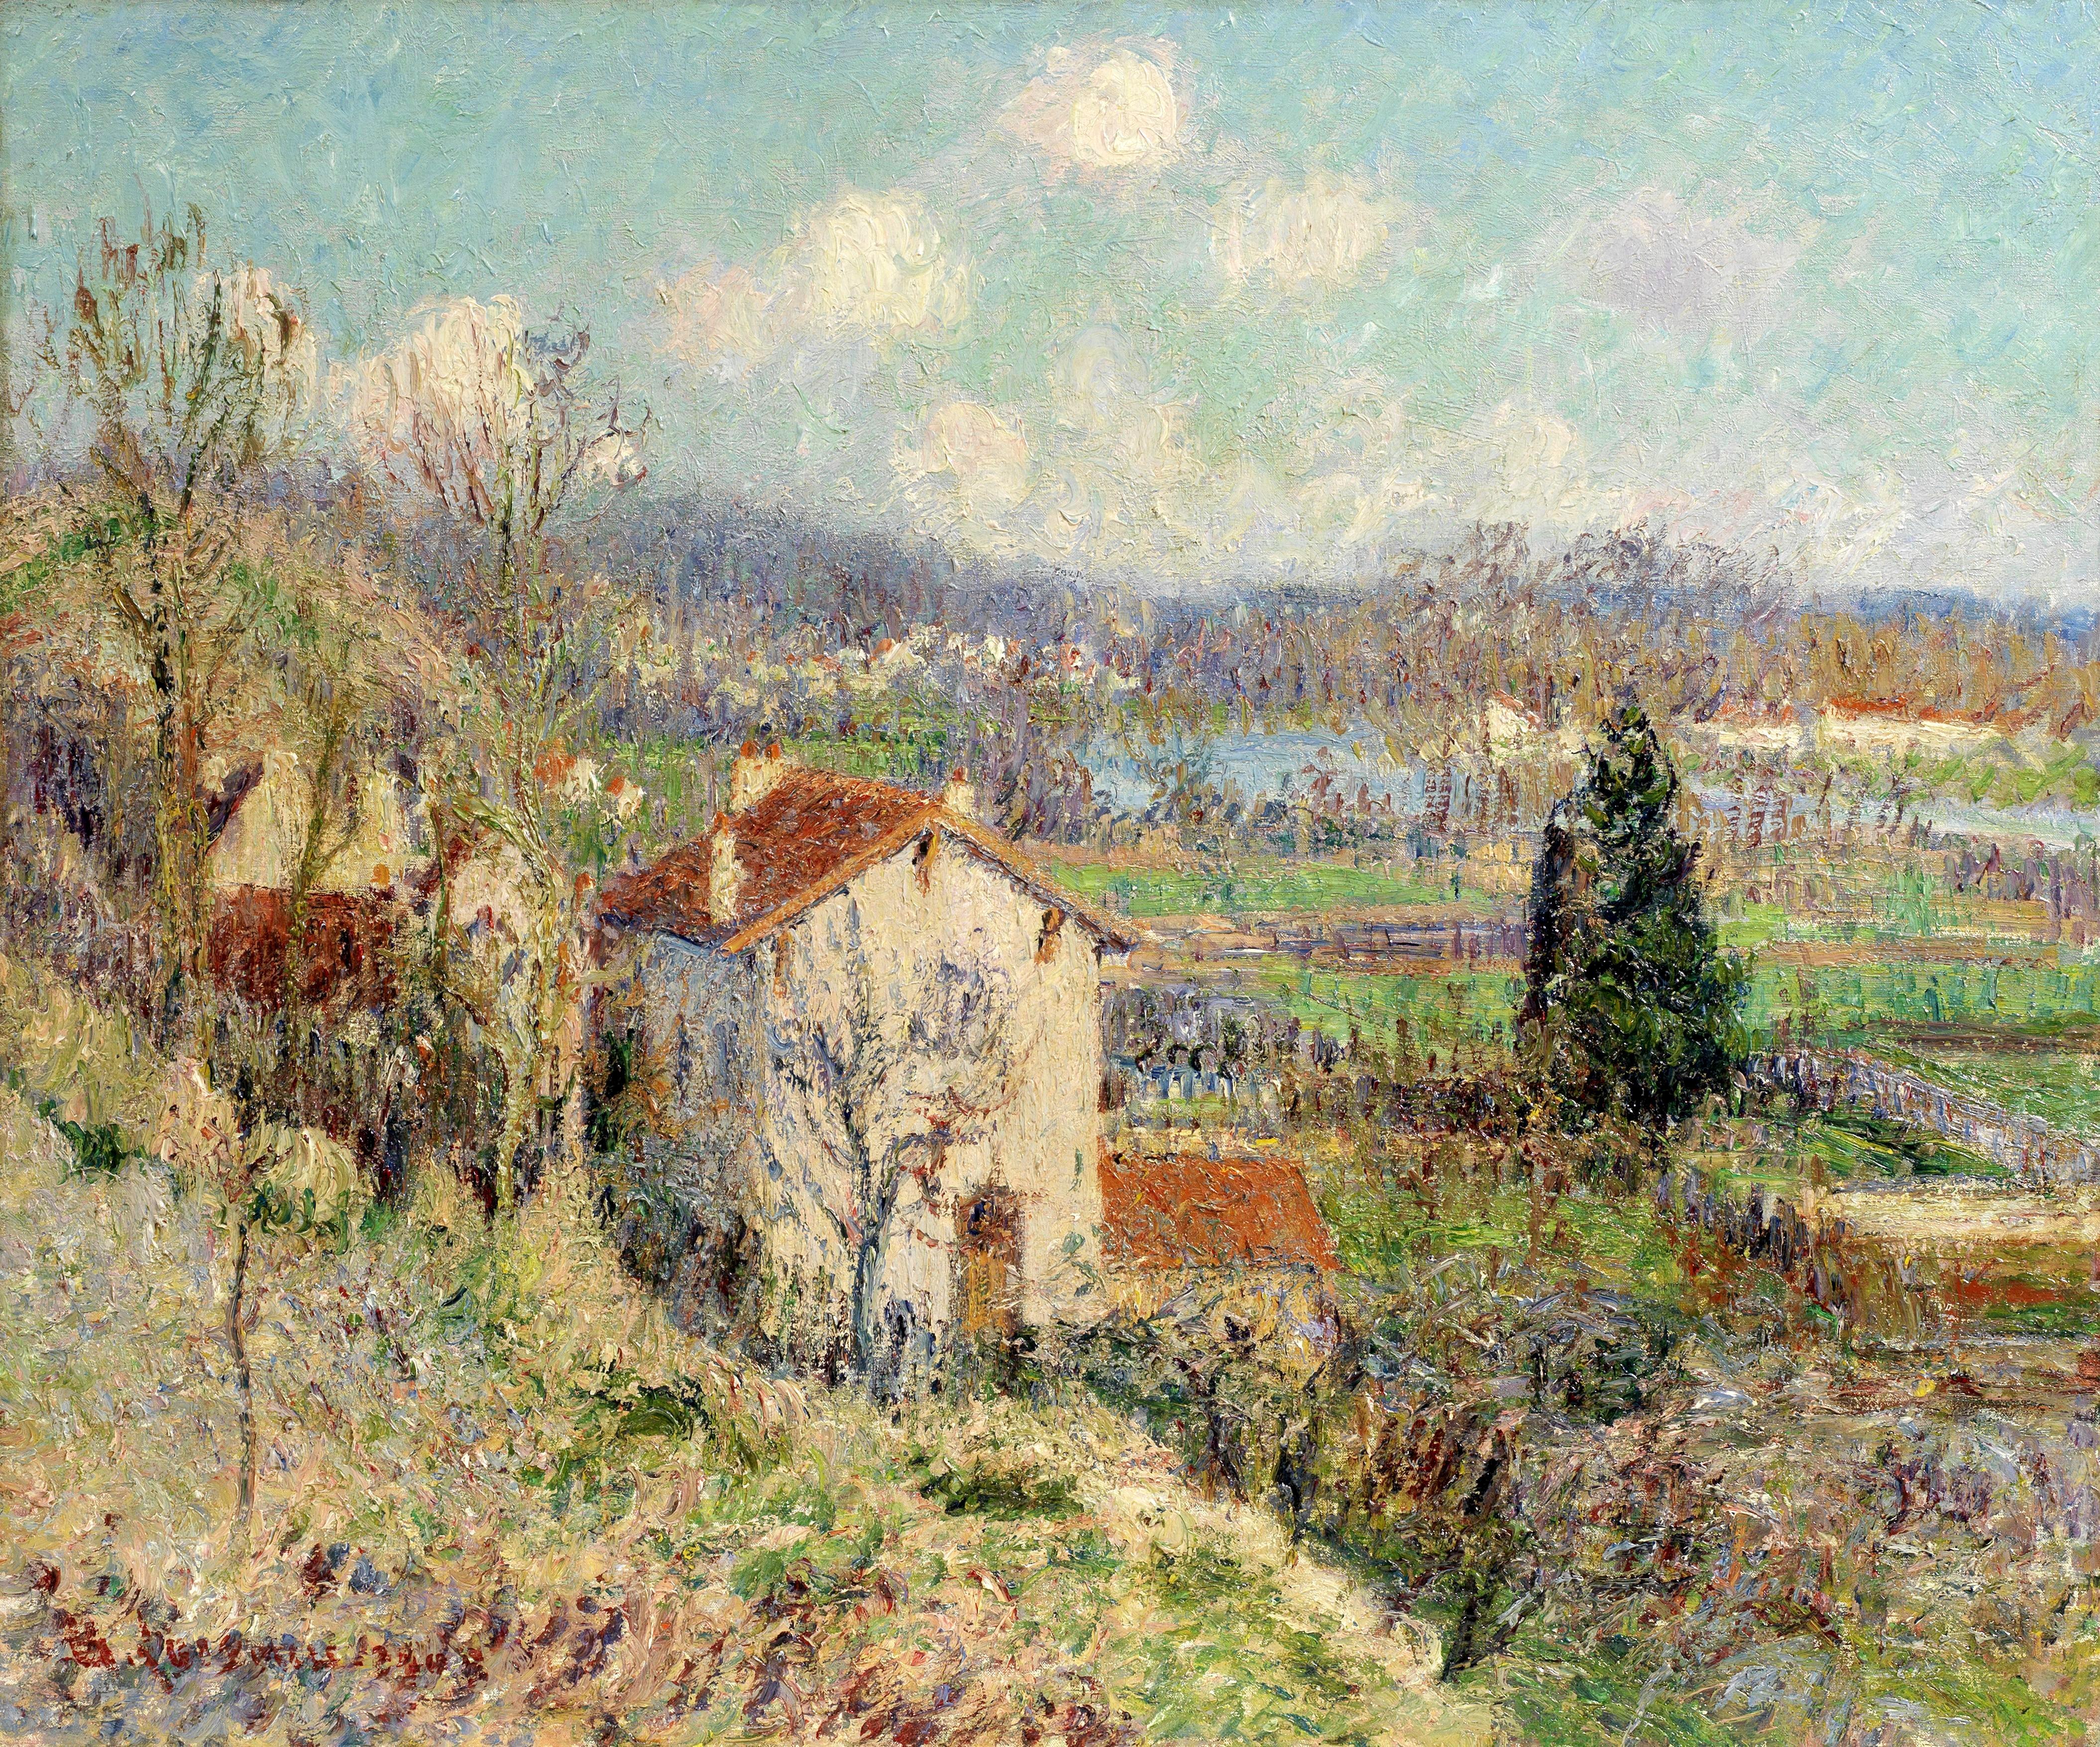 https://upload.wikimedia.org/wikipedia/commons/0/08/Gustave_Loiseau_-_La_vall%C3%A9e_de_l%27Oise%2C_environs_de_Pontoise_-_1905.jpg